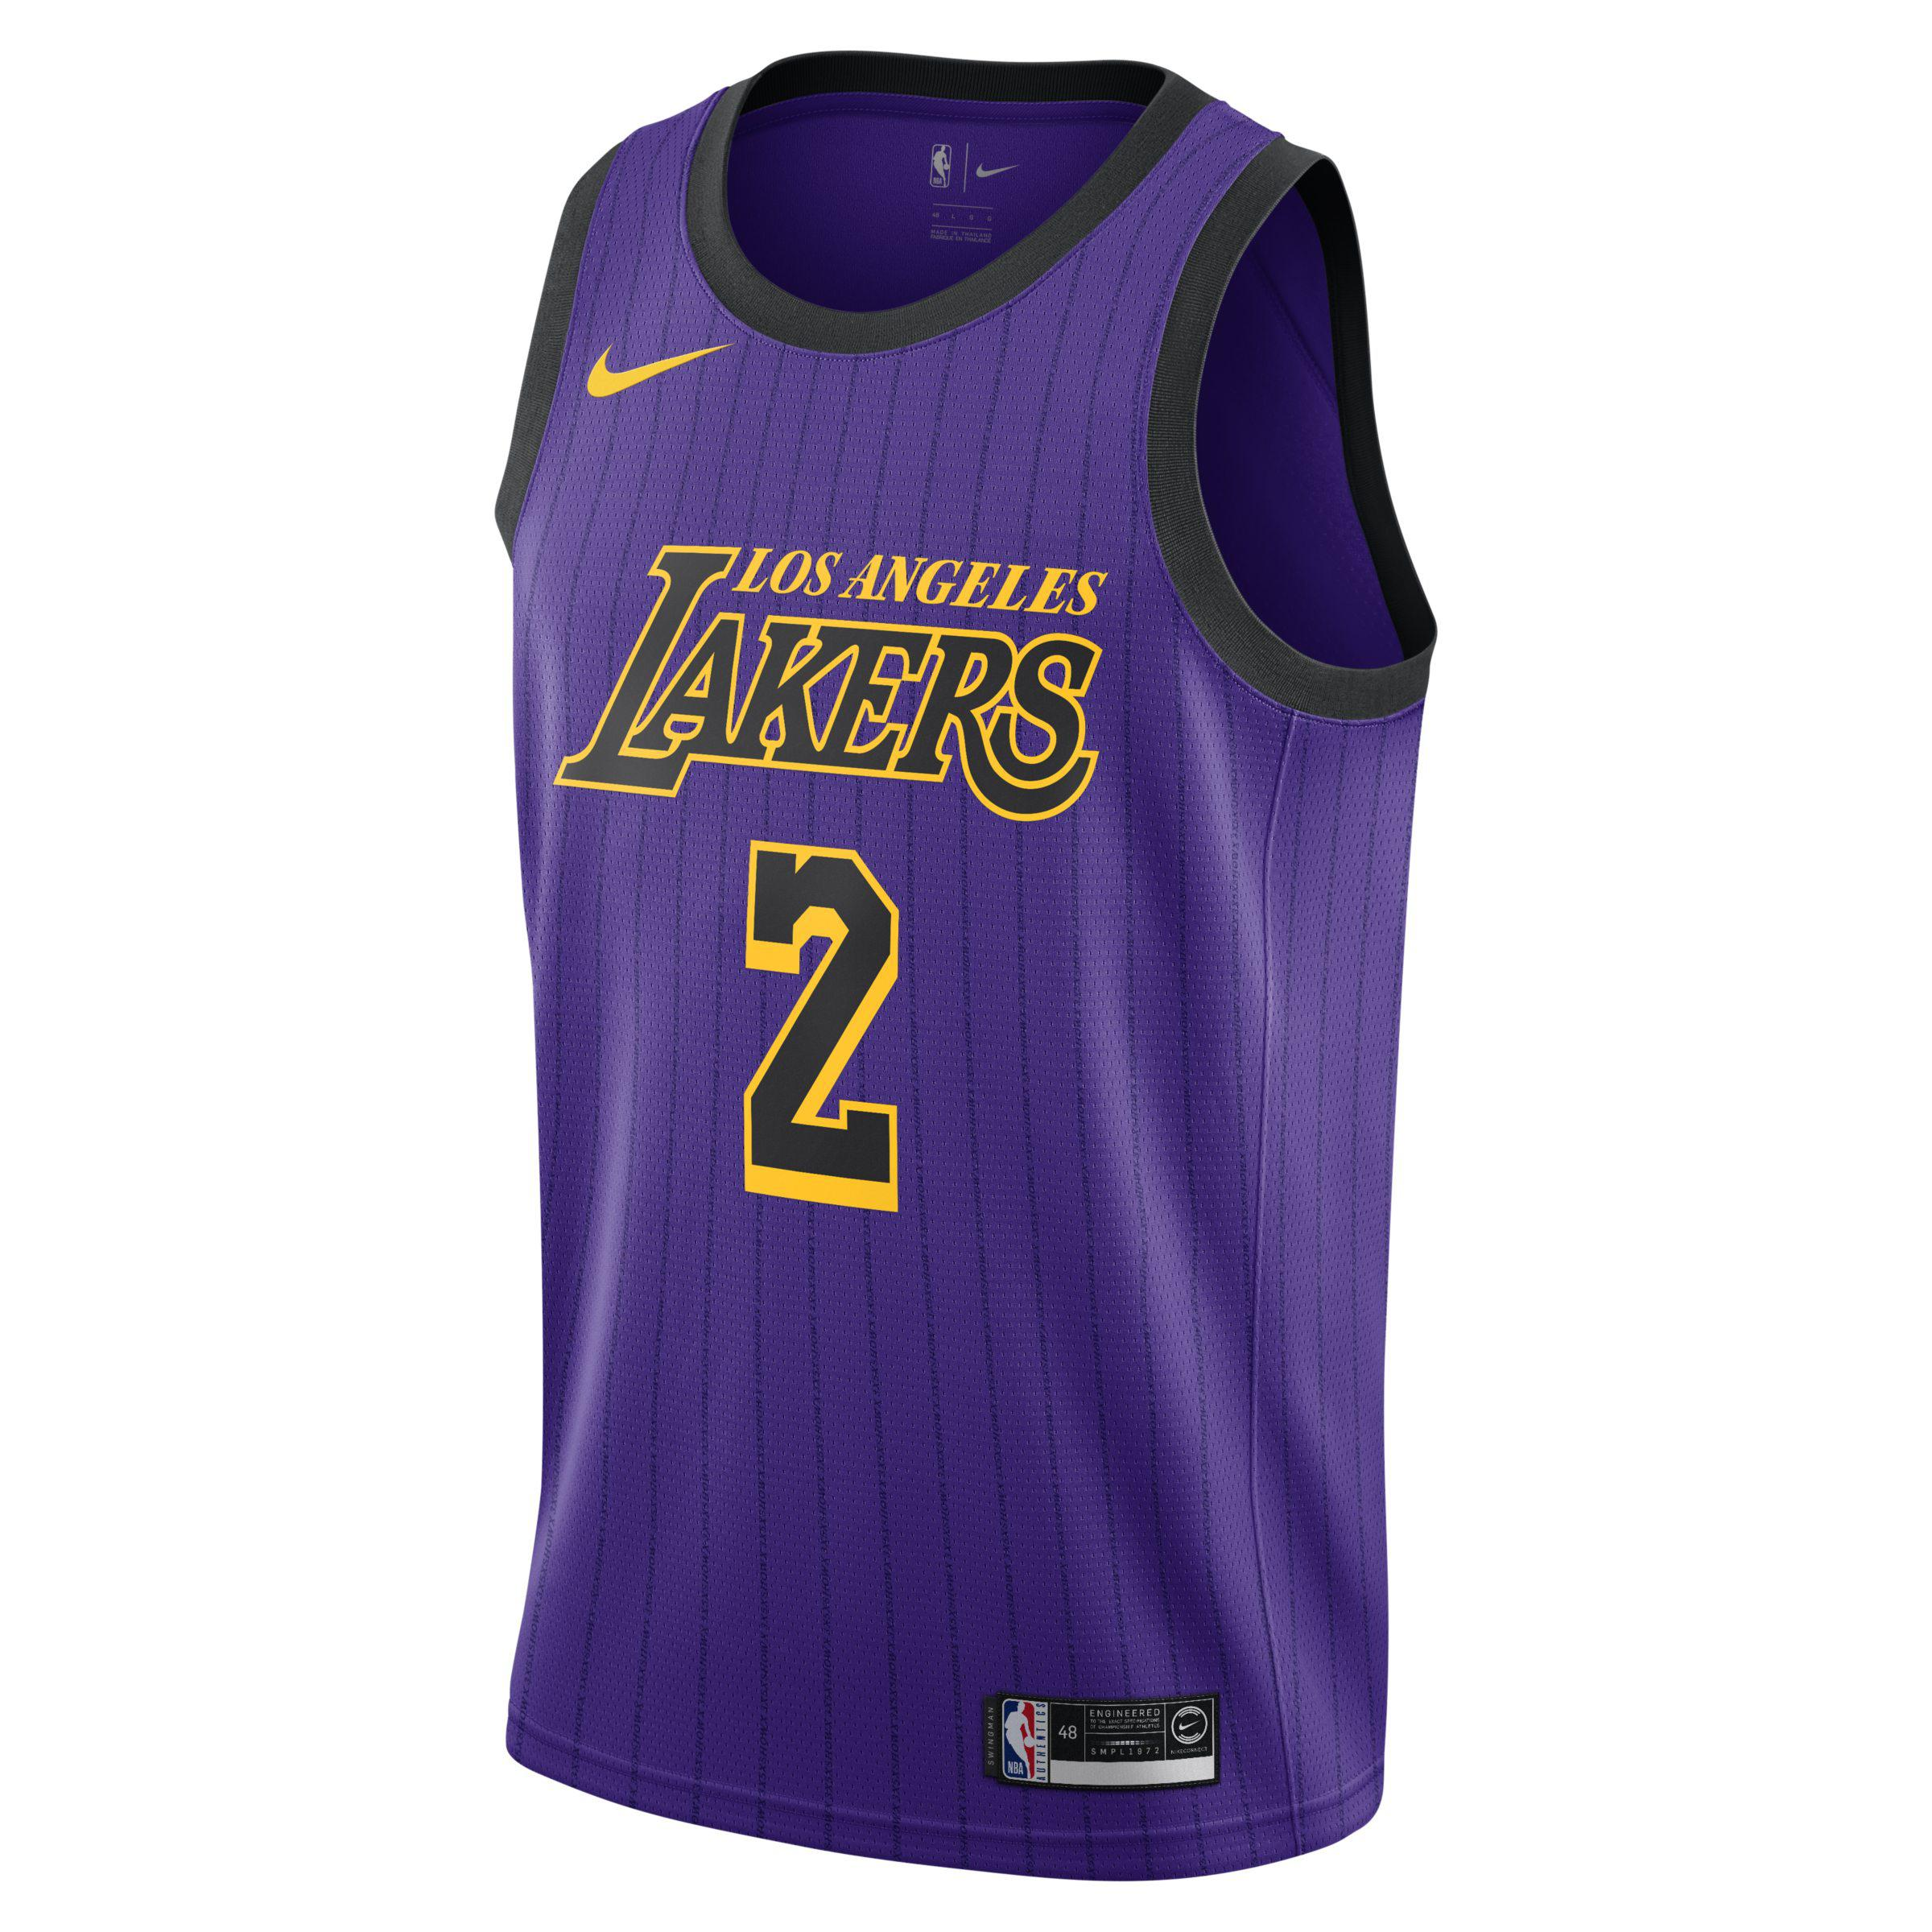 7cfa555a9619 Nike Lonzo Ball City Edition Swingman (los Angeles Lakers) Nba ...